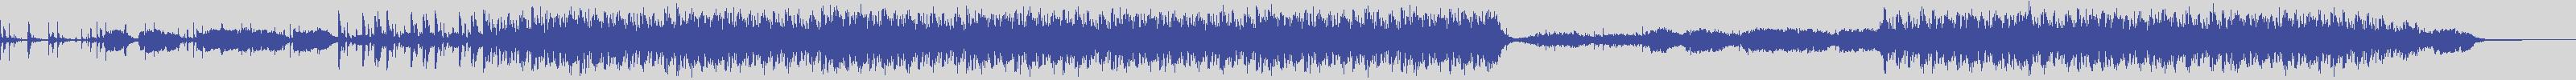 just_digital_records [JS1224] Nikon - Egyptian Trip [Original Mix] audio wave form